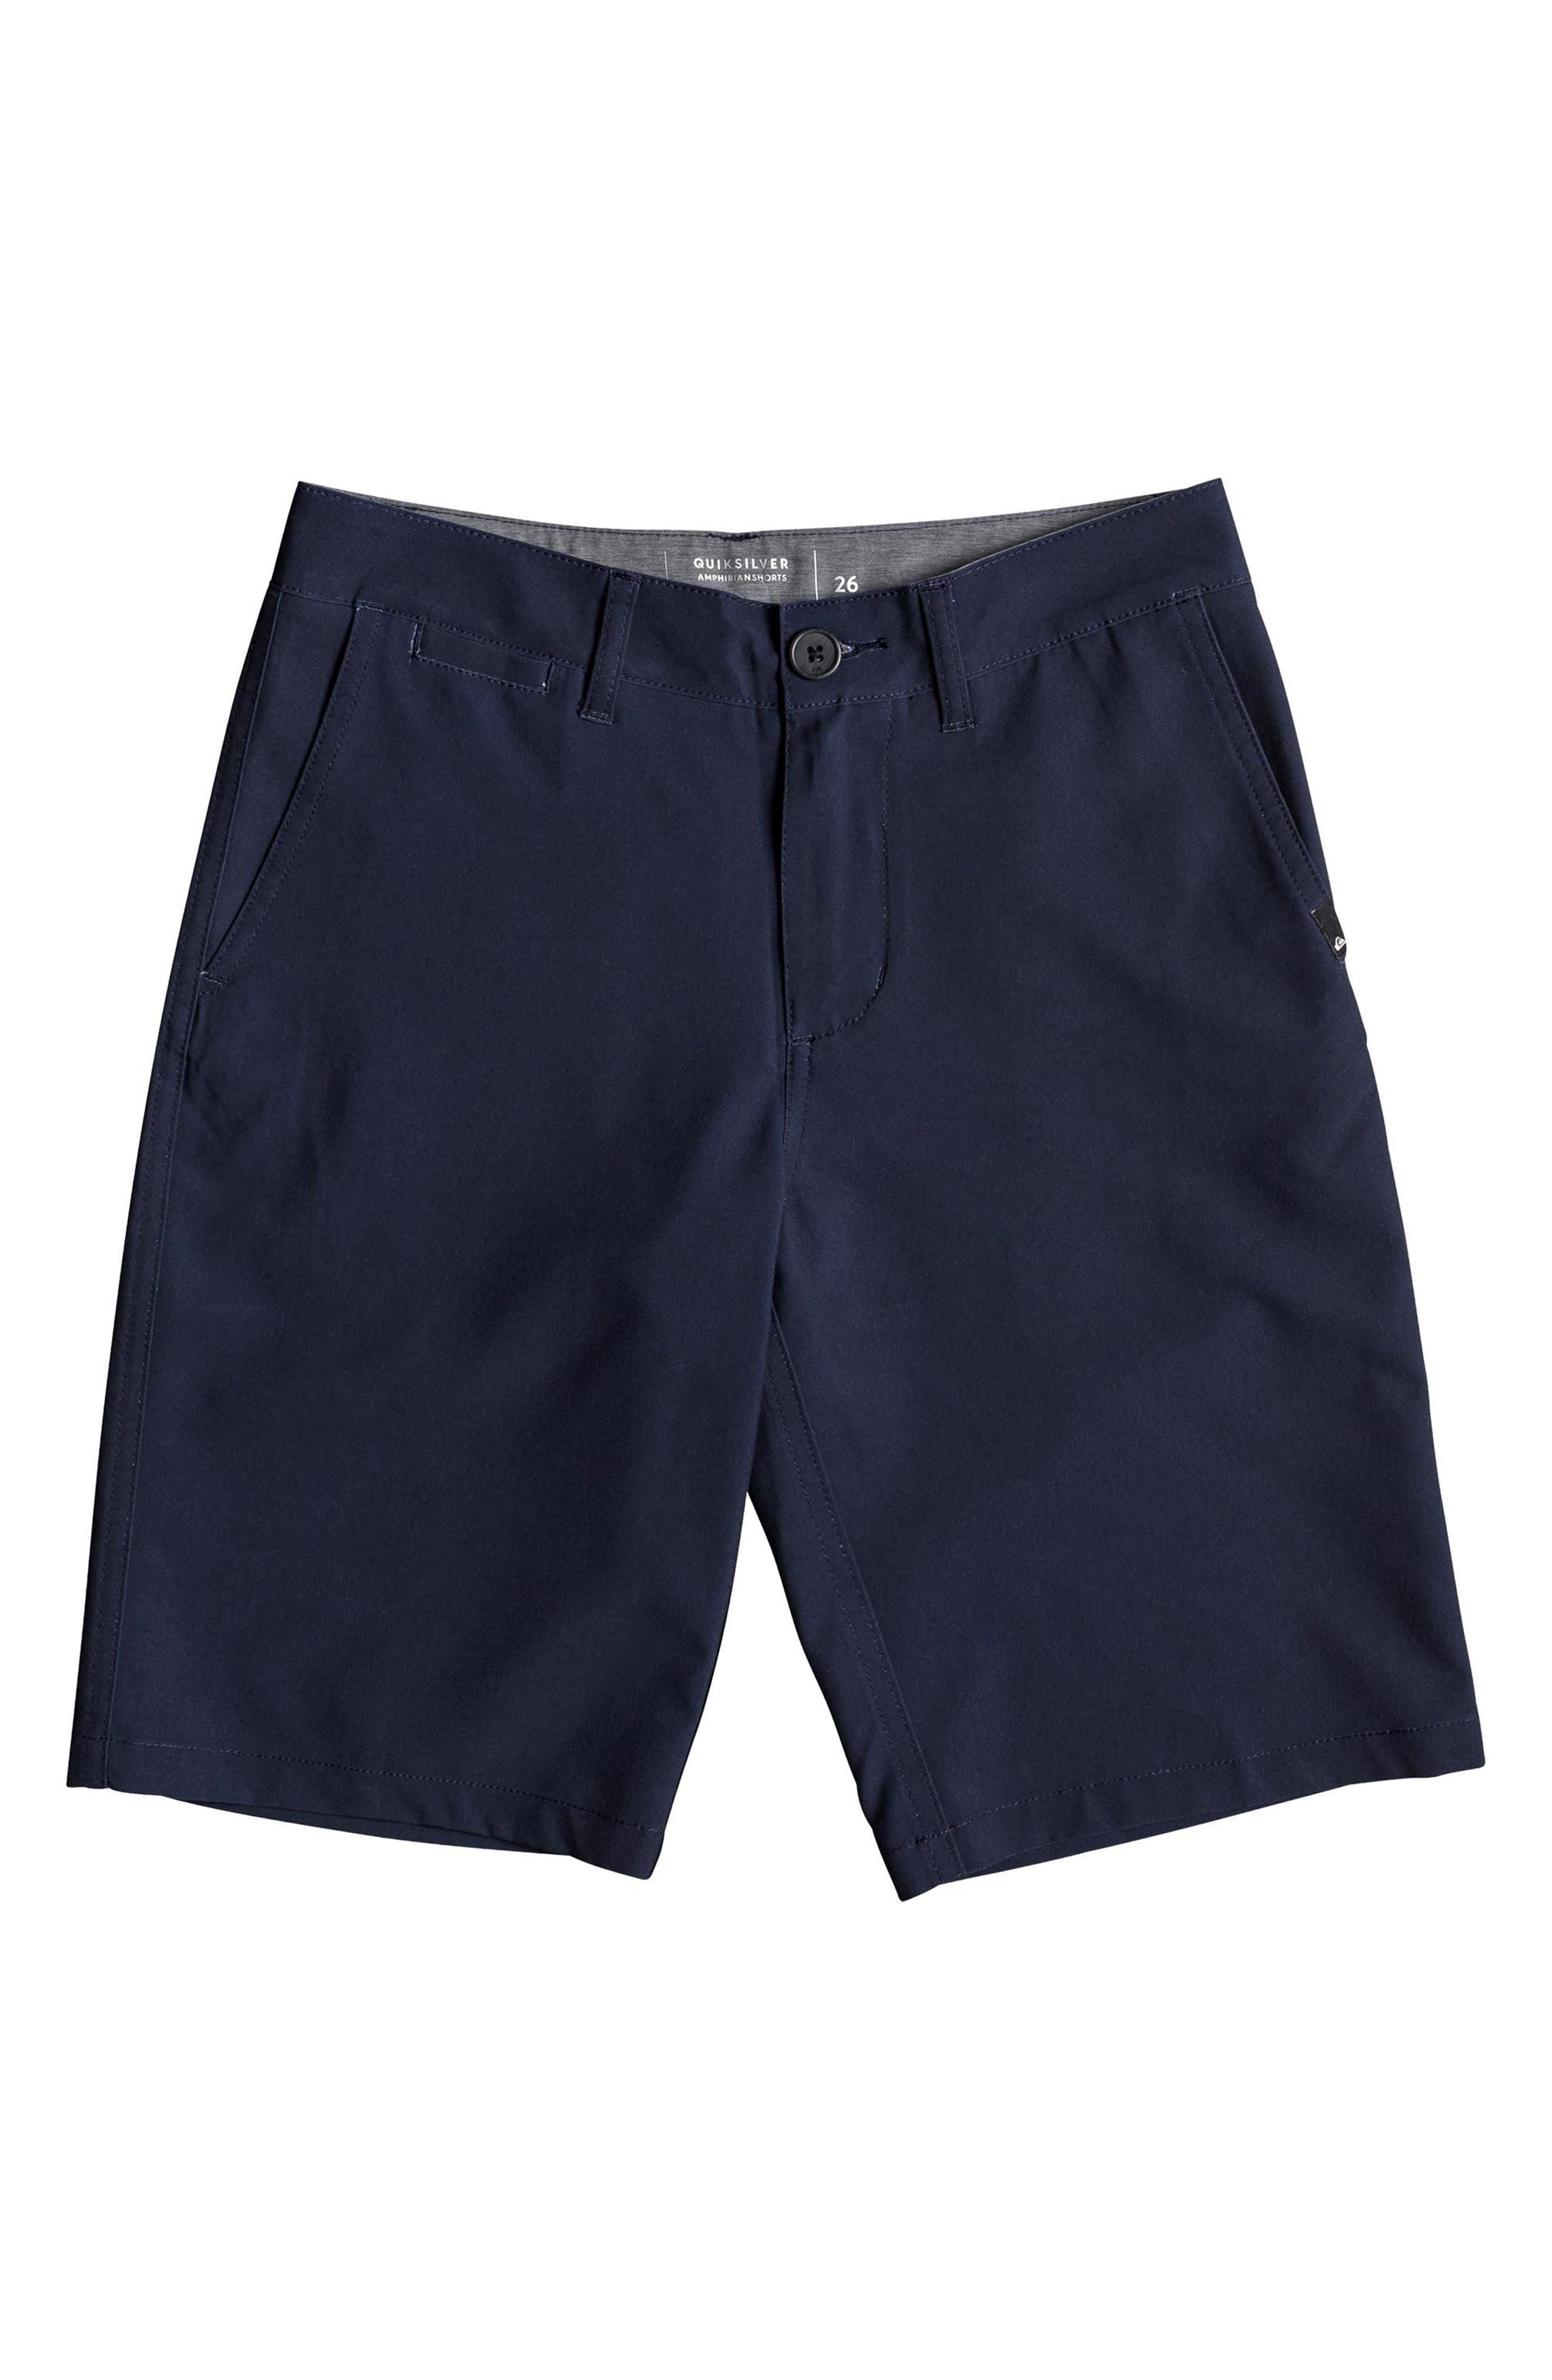 Union Amphibian Hybrid Shorts,                             Main thumbnail 1, color,                             NAVY BLAZER